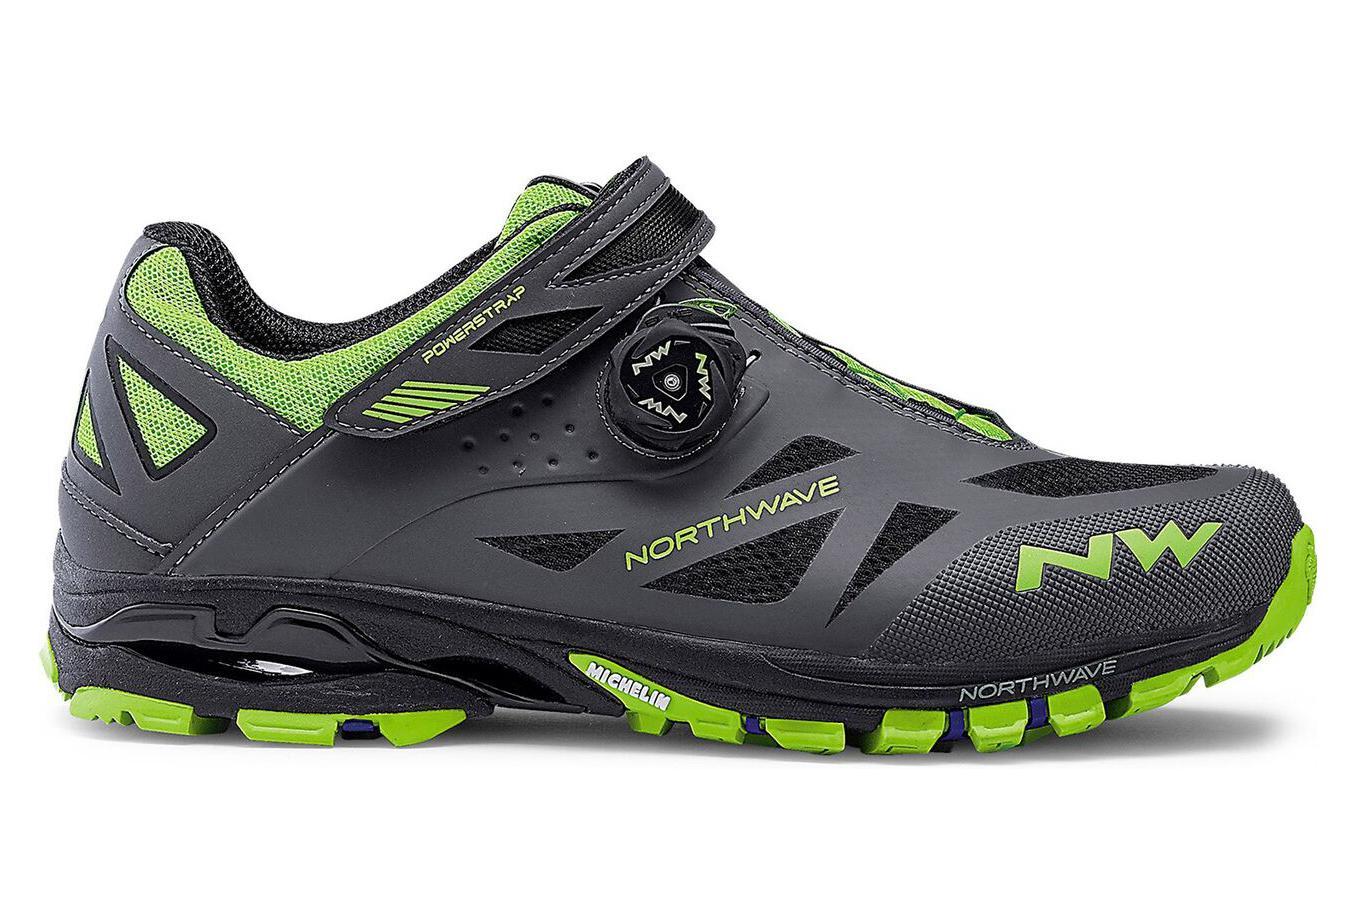 526e2c7e12a Chaussures VTT Northwave Spider Plus 2 Anthracite Vert